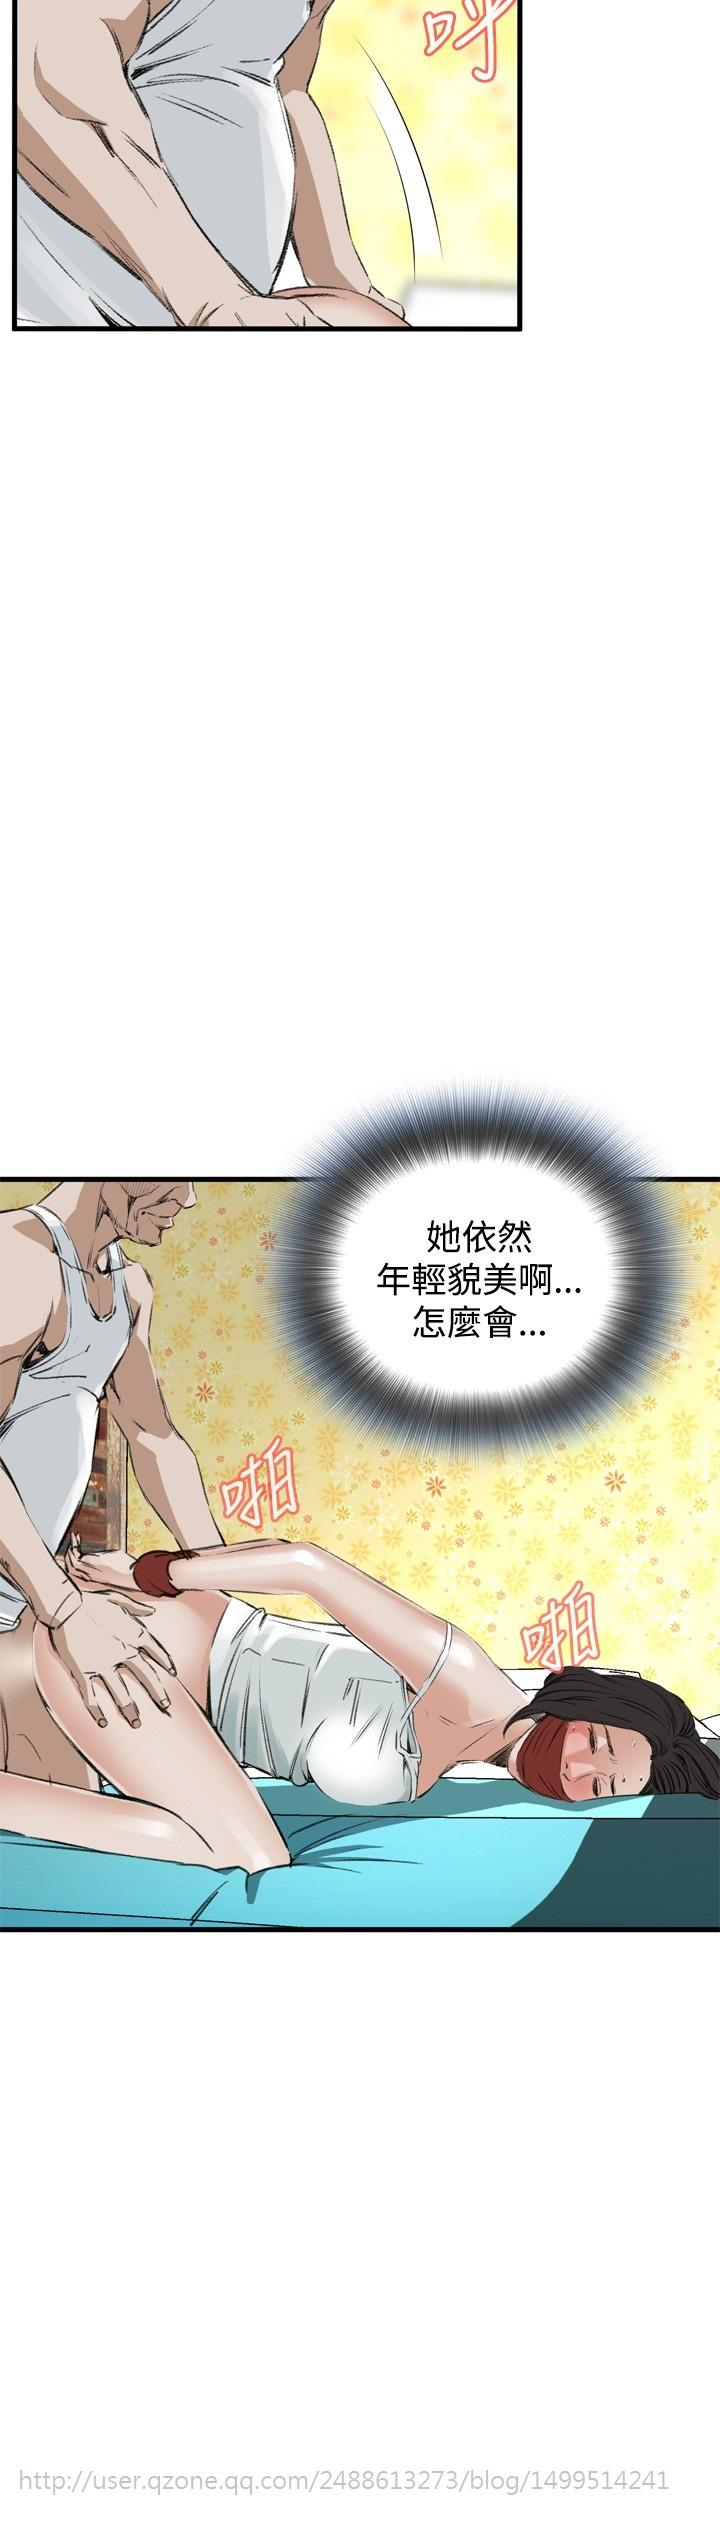 Take a Peek 偷窥 Ch.39~60 [Chinese]中文 162